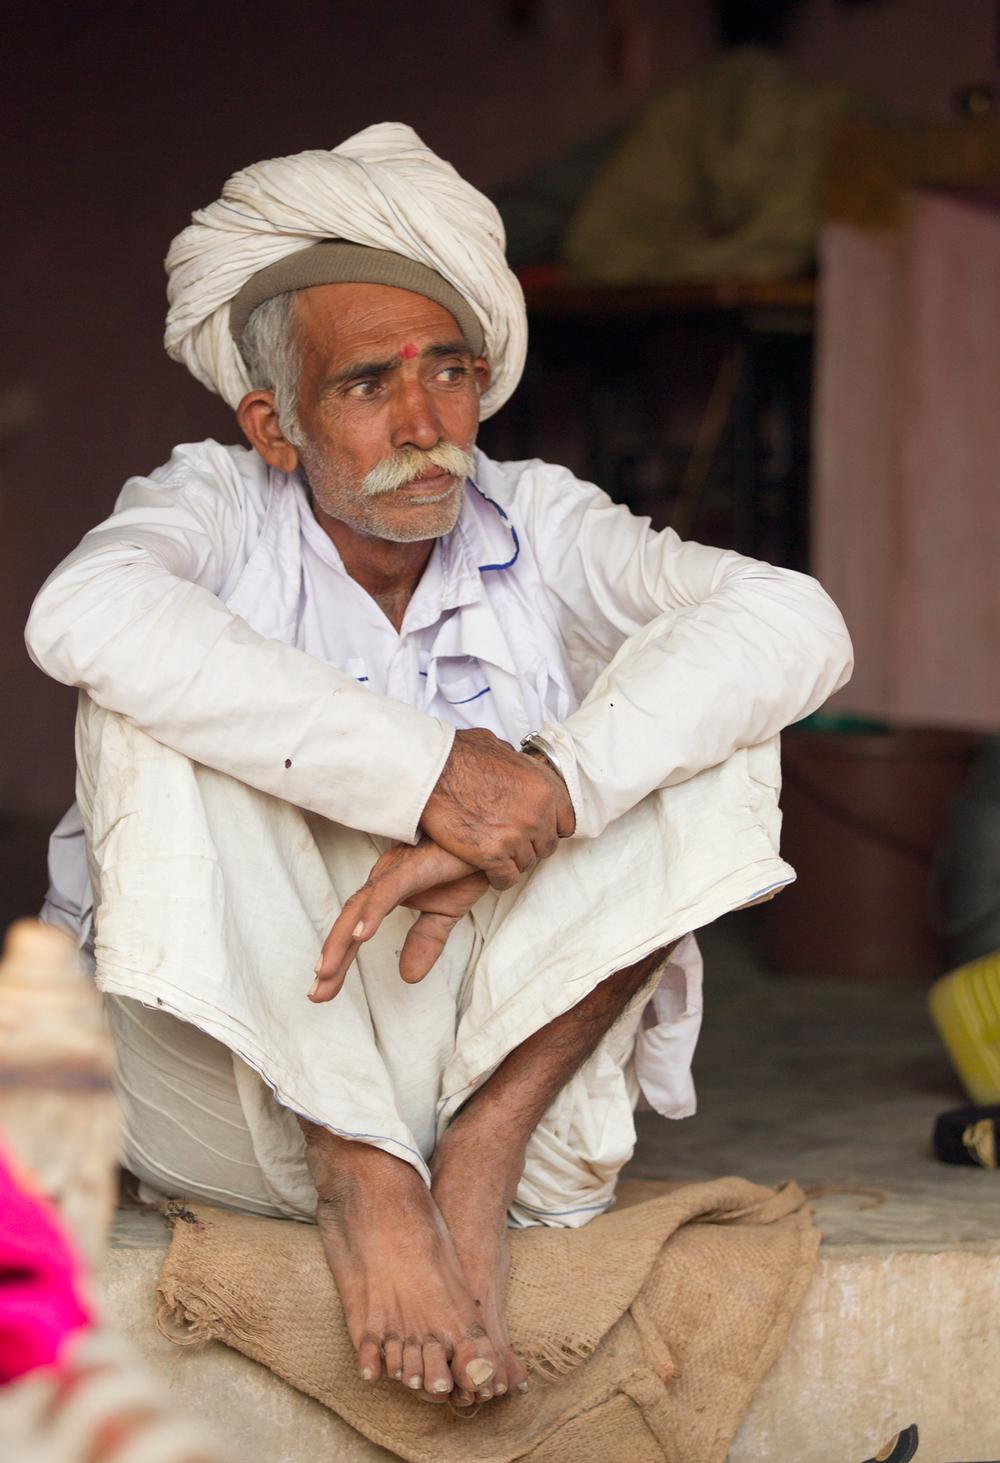 Village life, Zainabad, Gujarat, Feb 2013